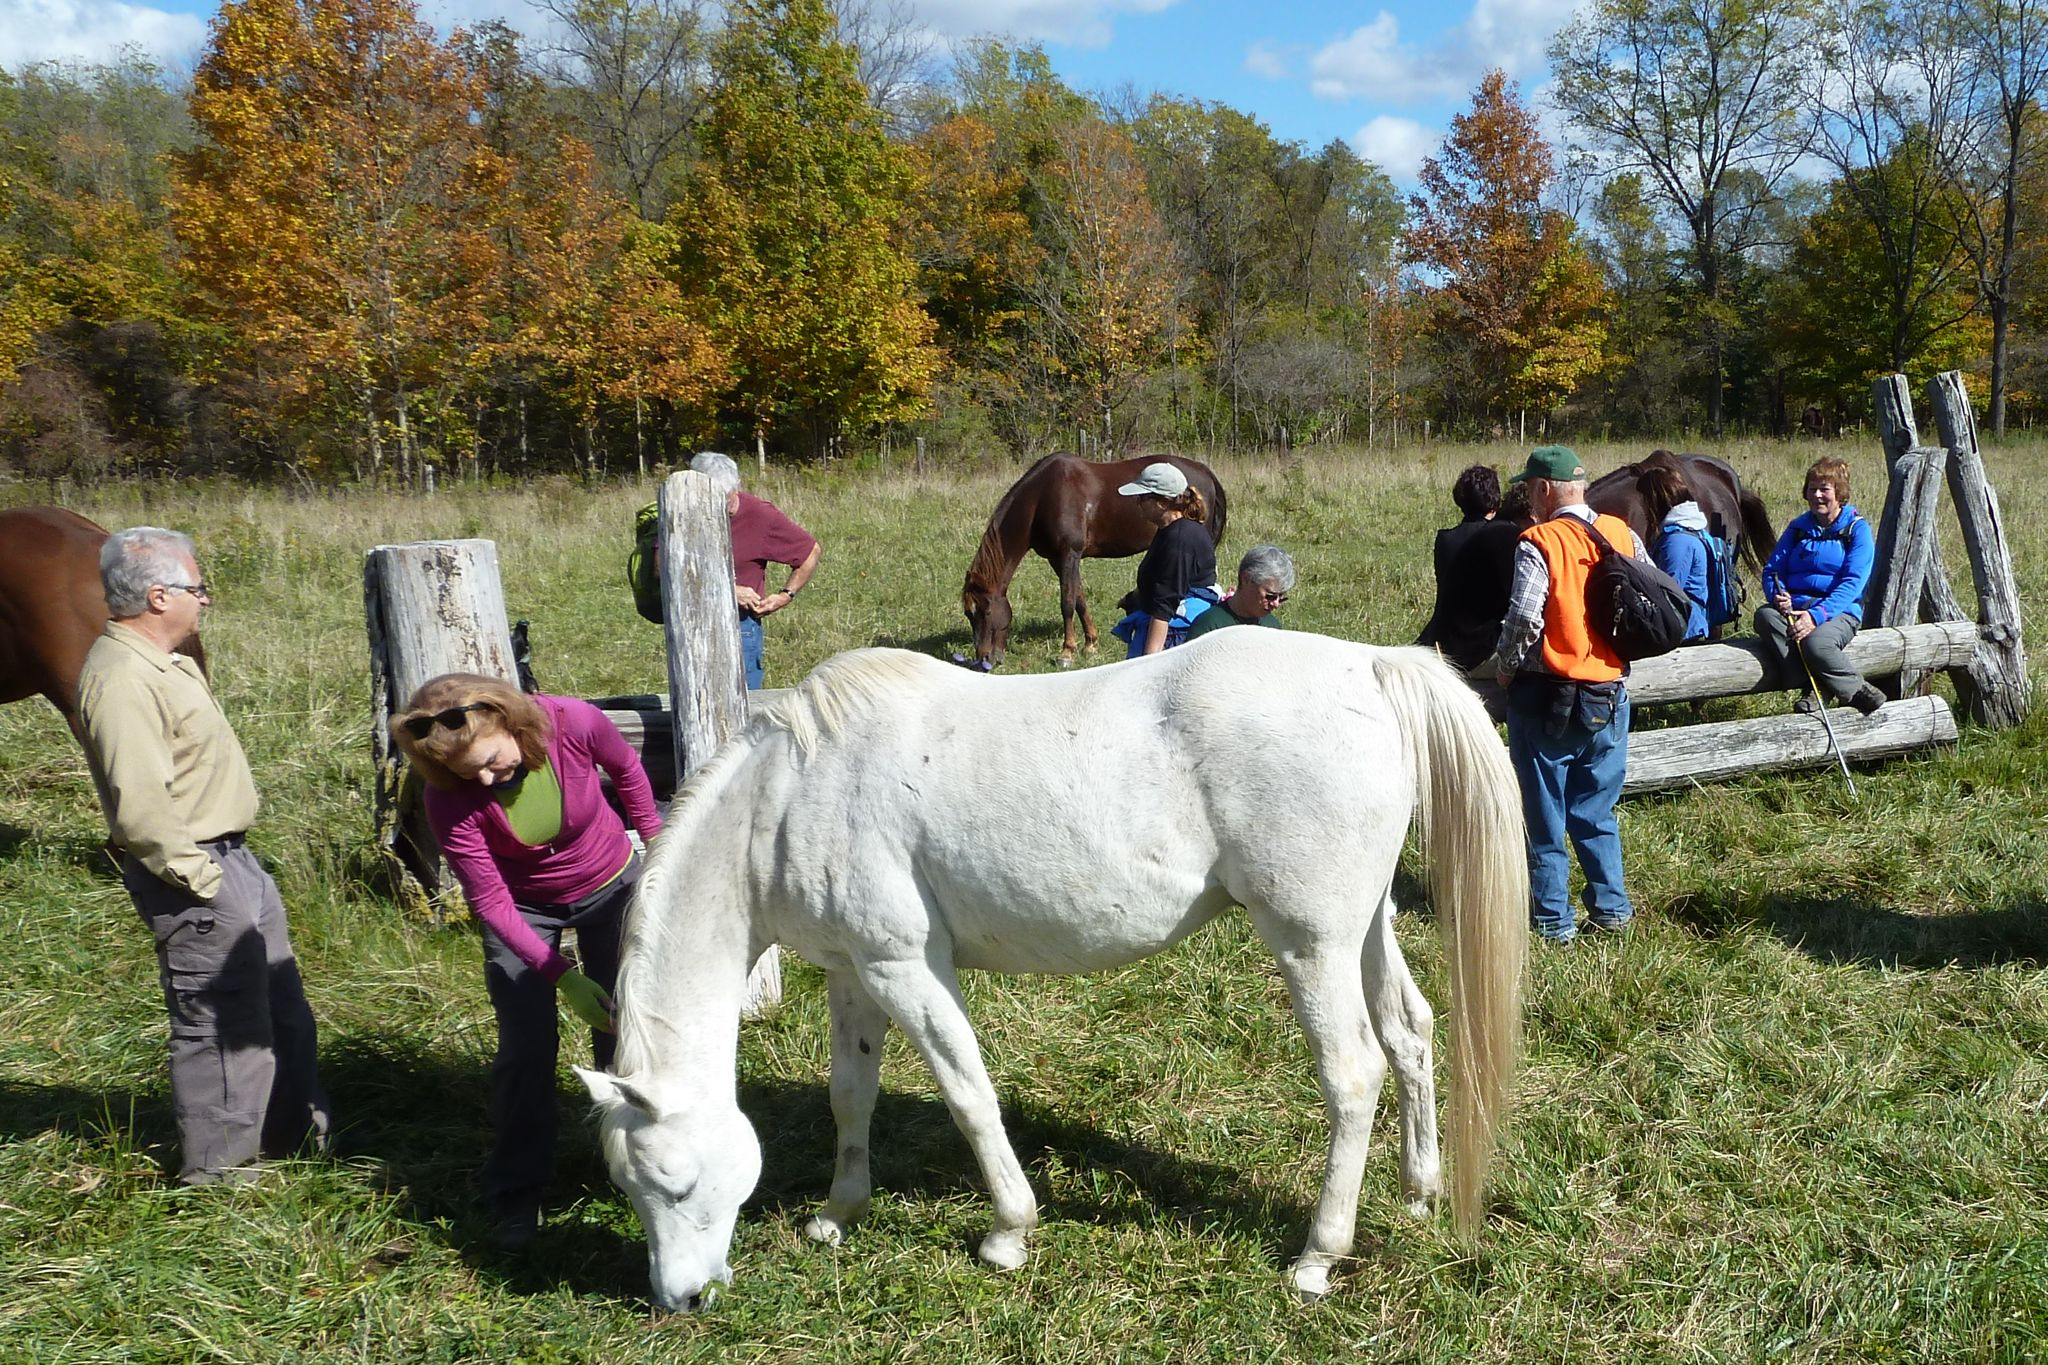 Horses_40806